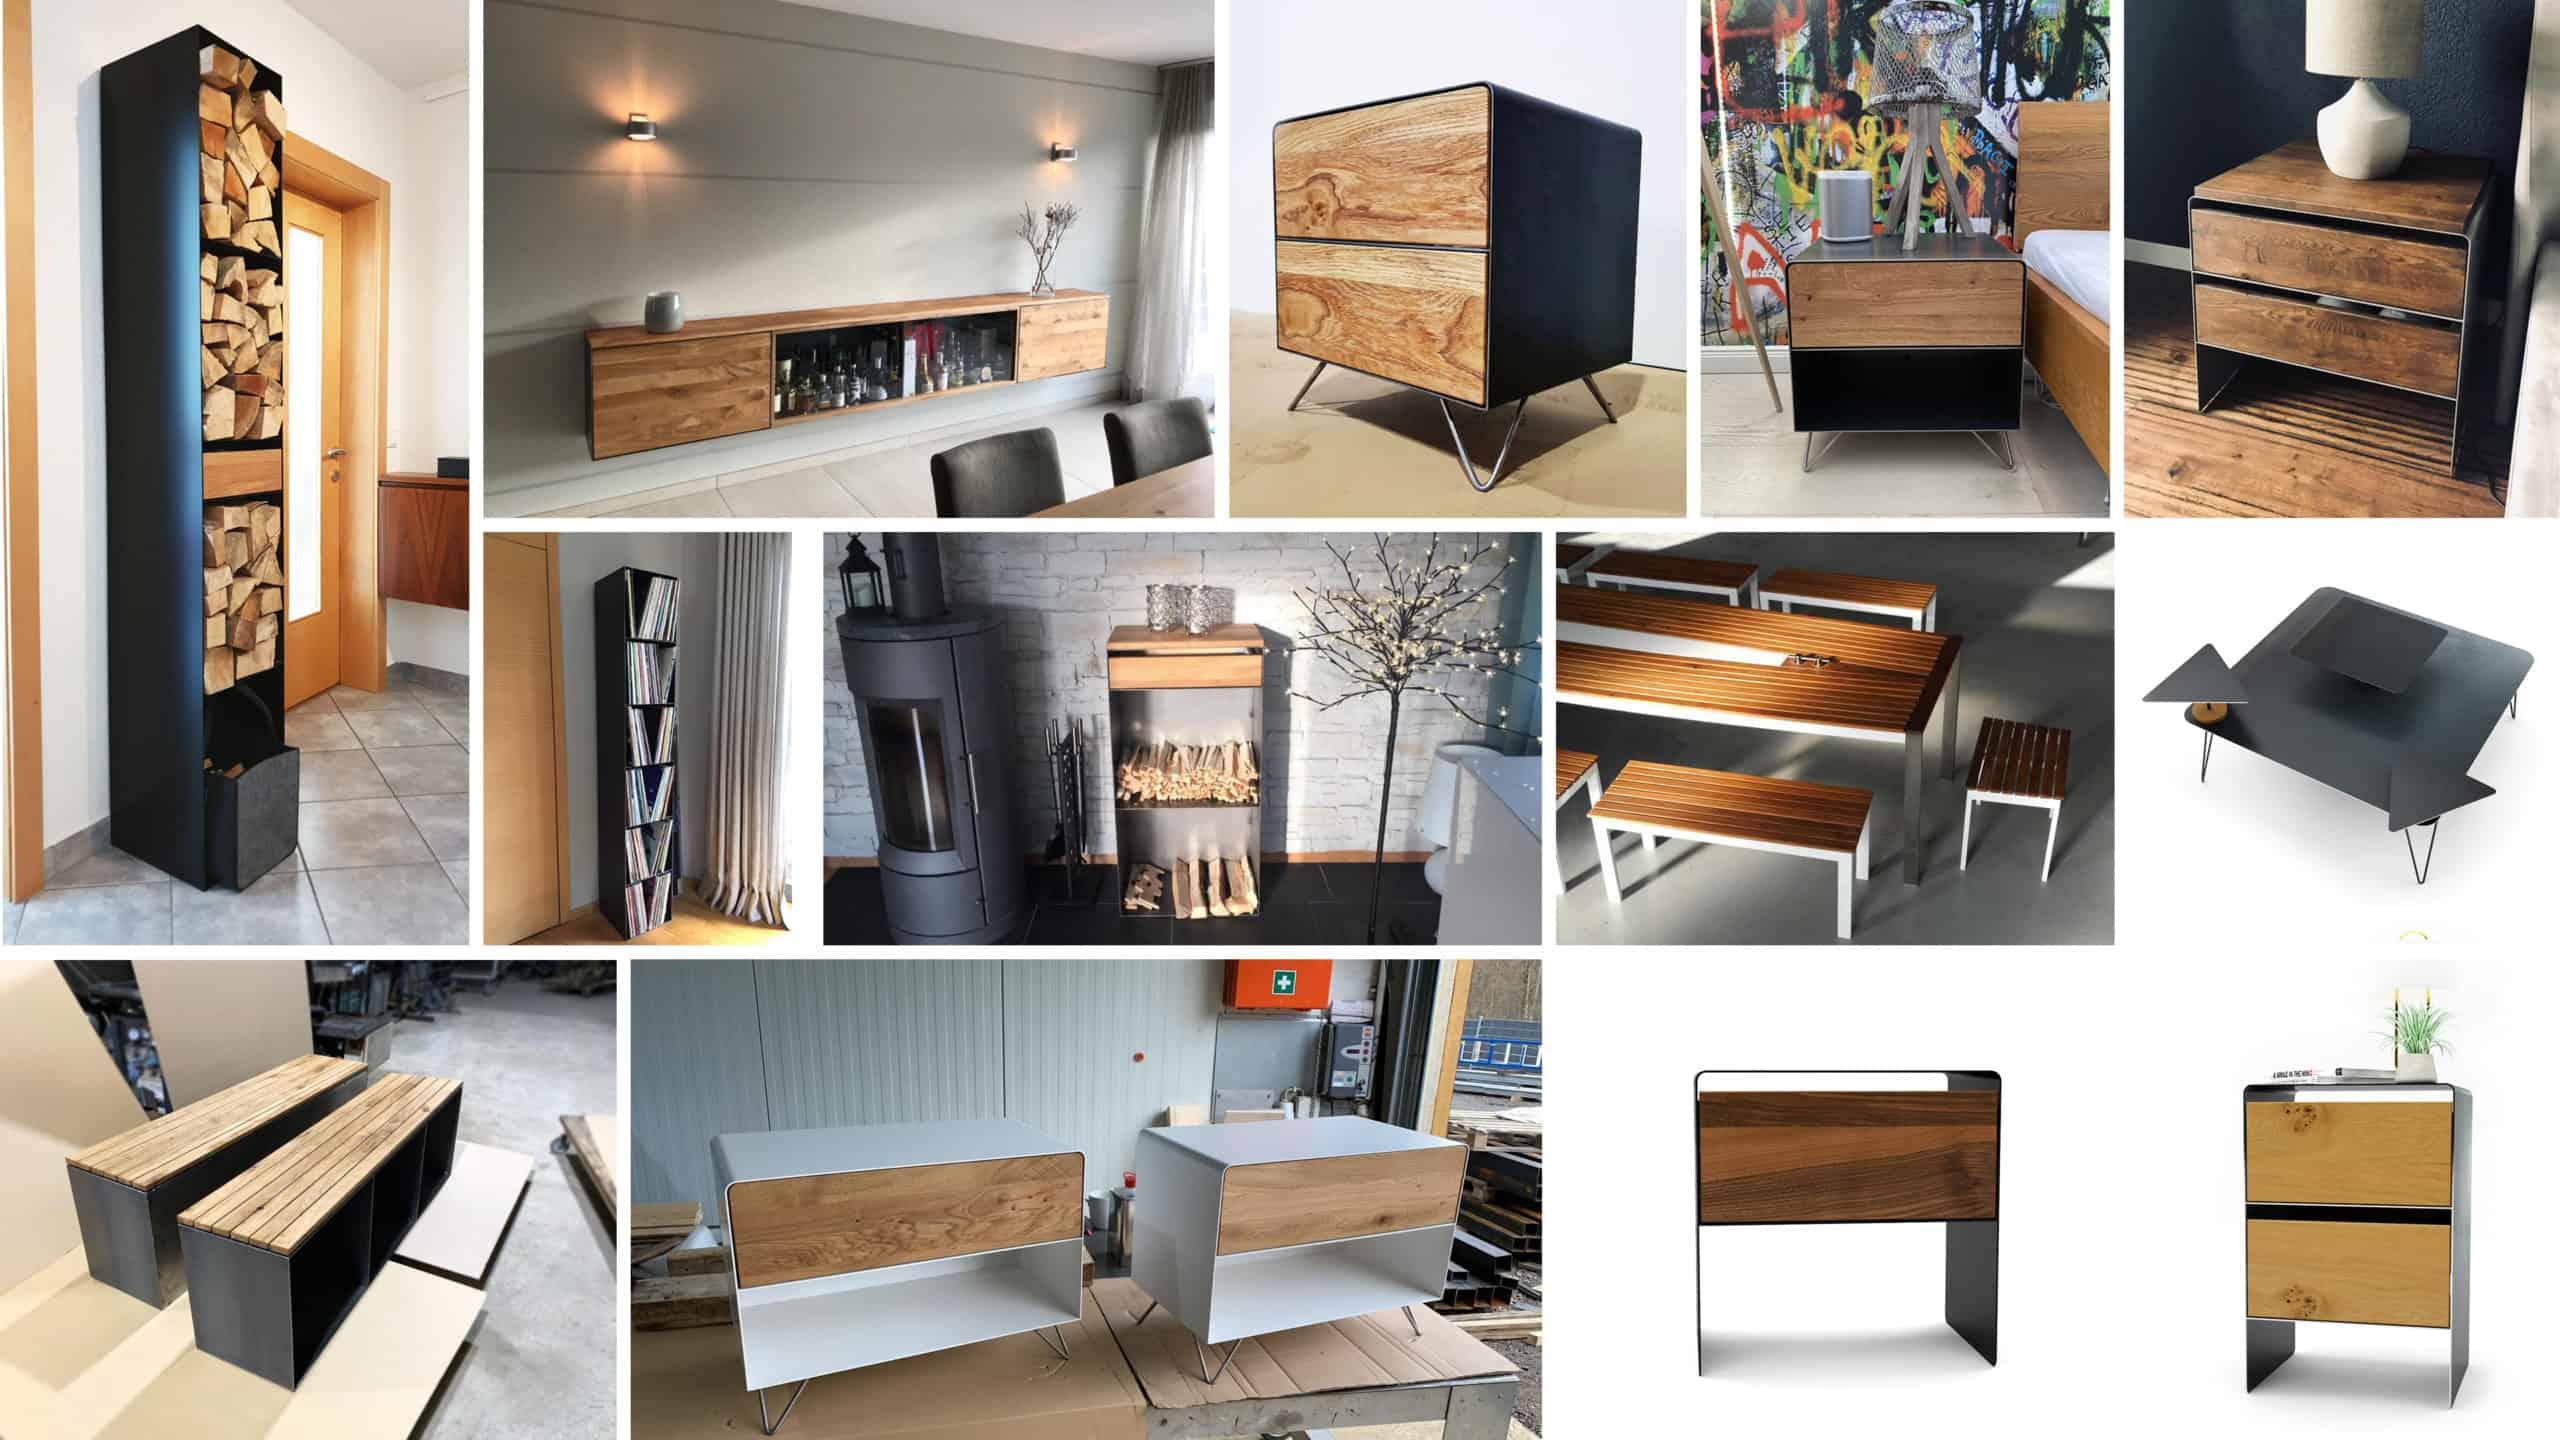 stahlzart-moebel-sideboard-kommode-nachttisch-regal-bank-gartenmoebel-lowboard-highboard-hocker-sitzbank-gartenbank-gartenhocker-kaminholzregal-tisch-beistelltisch-desktop